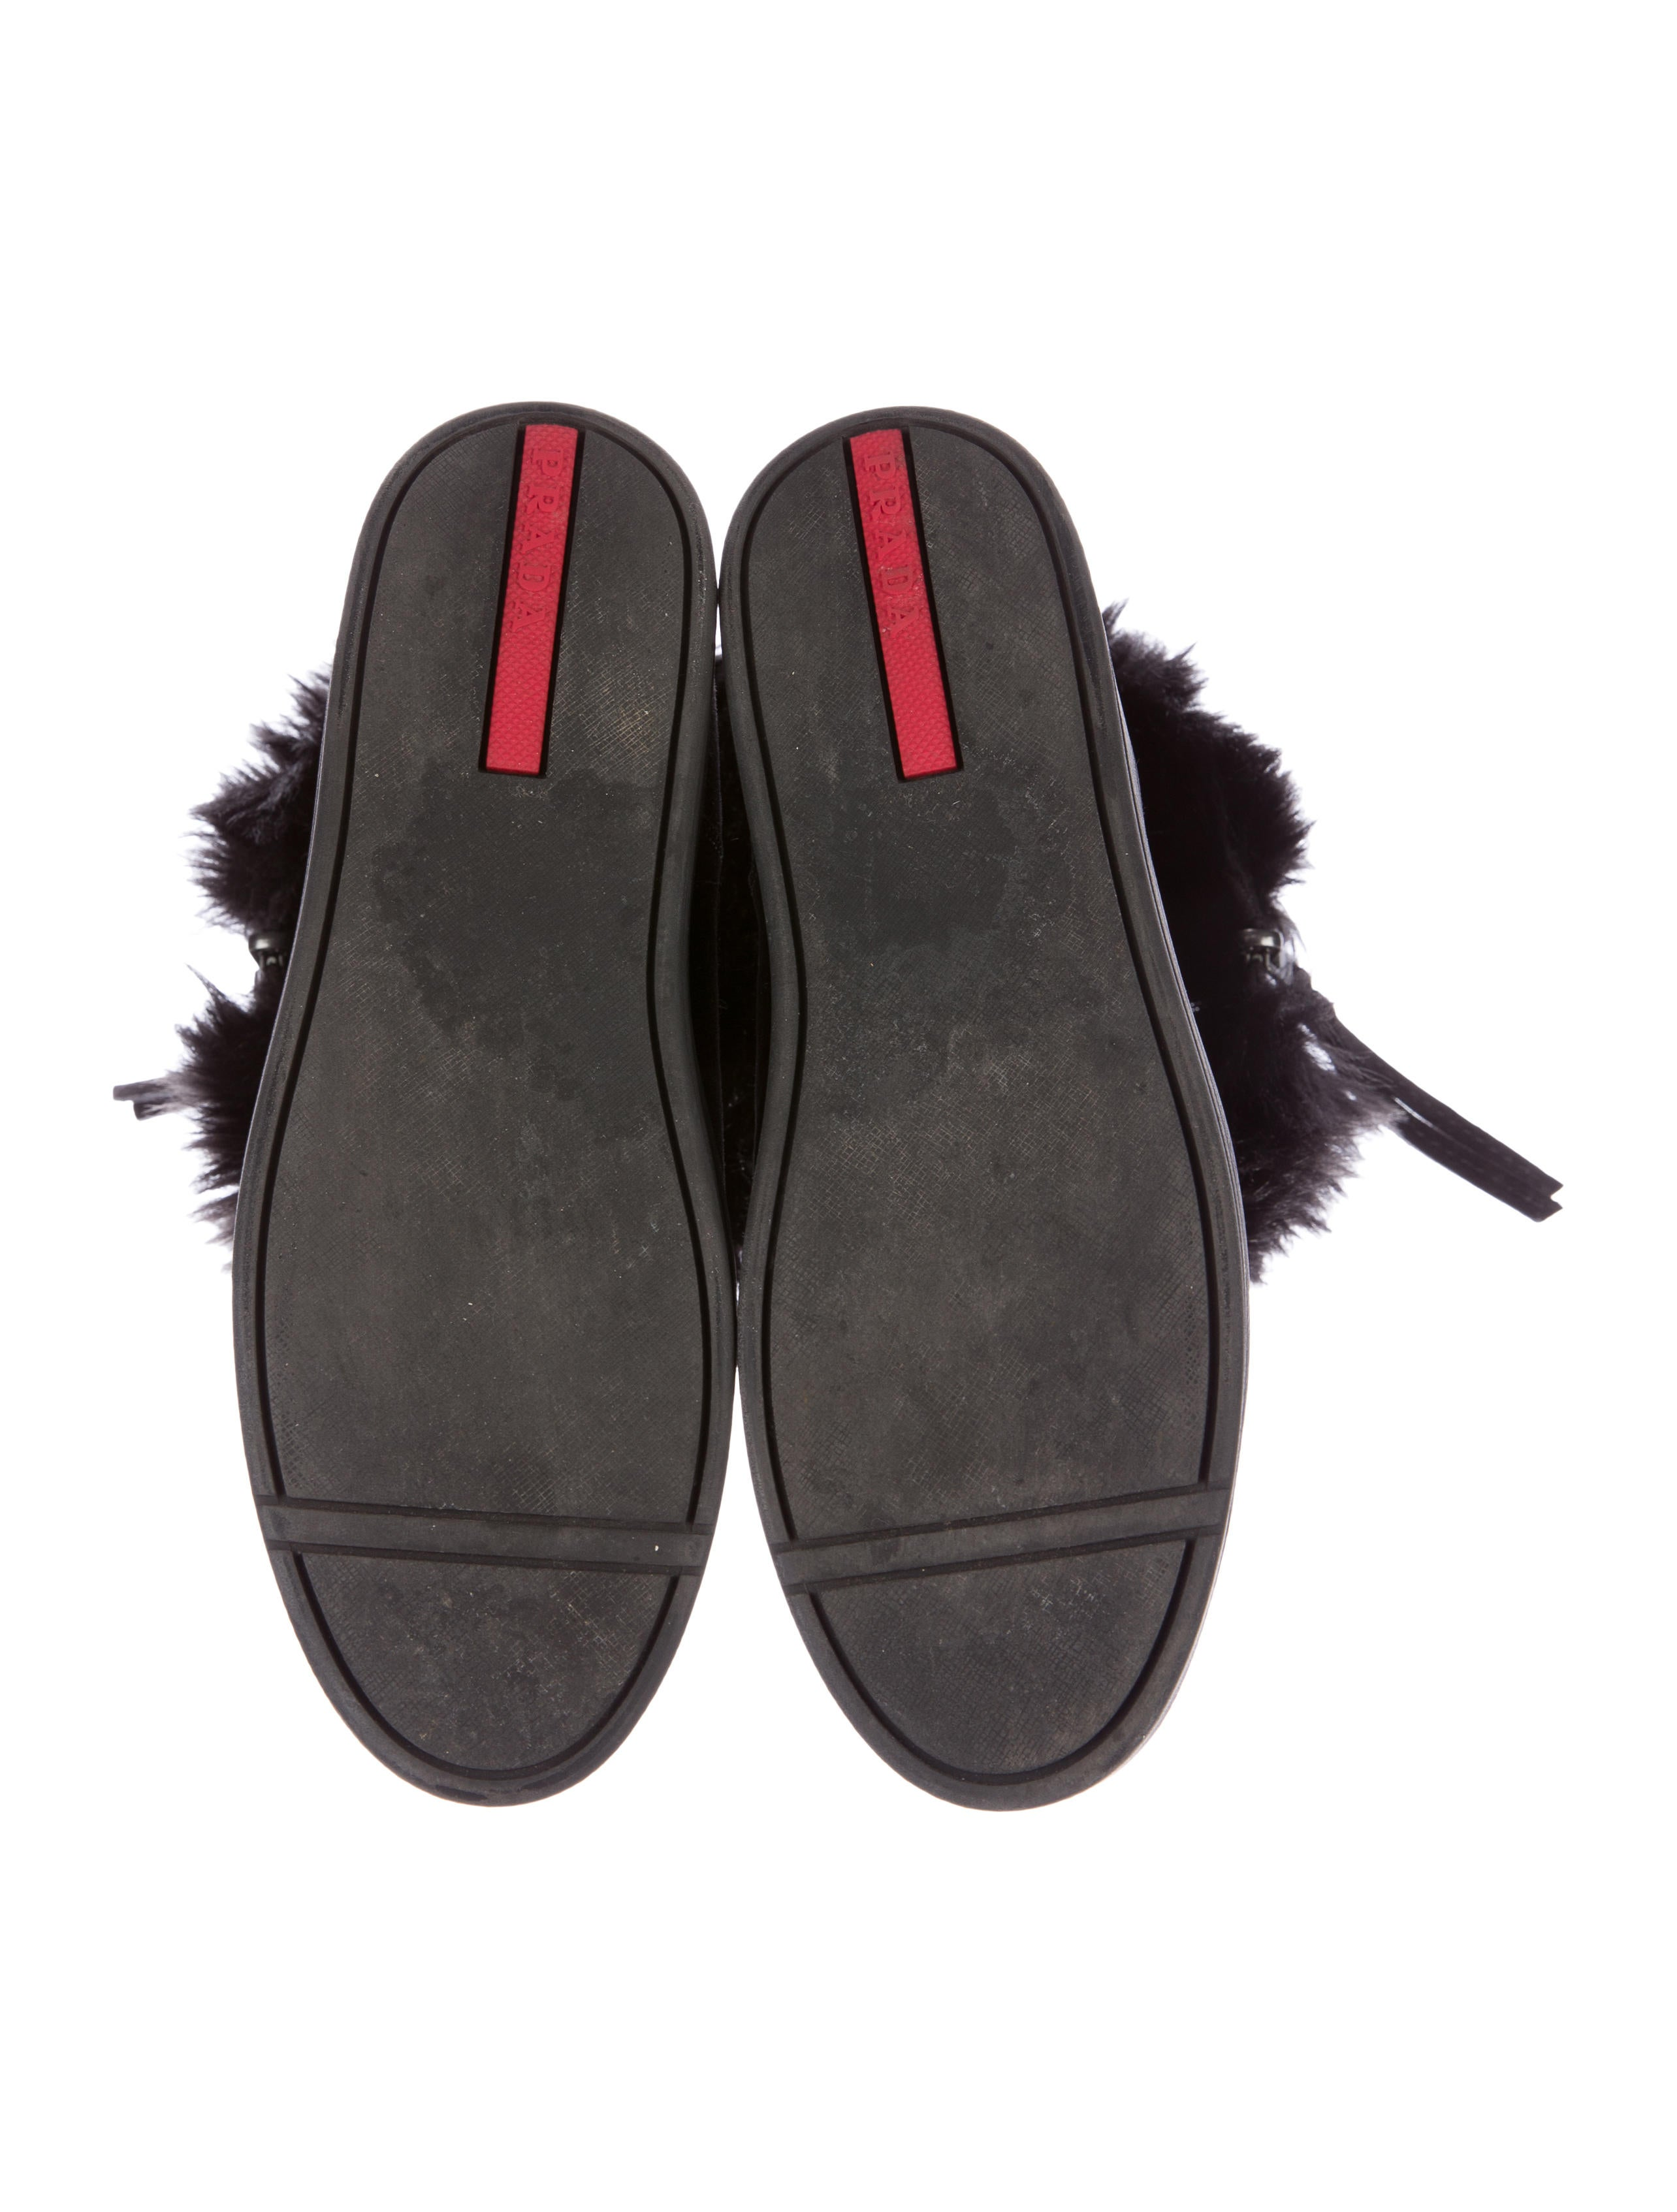 prada sport faux fur lined suede boot shoes wpr35238